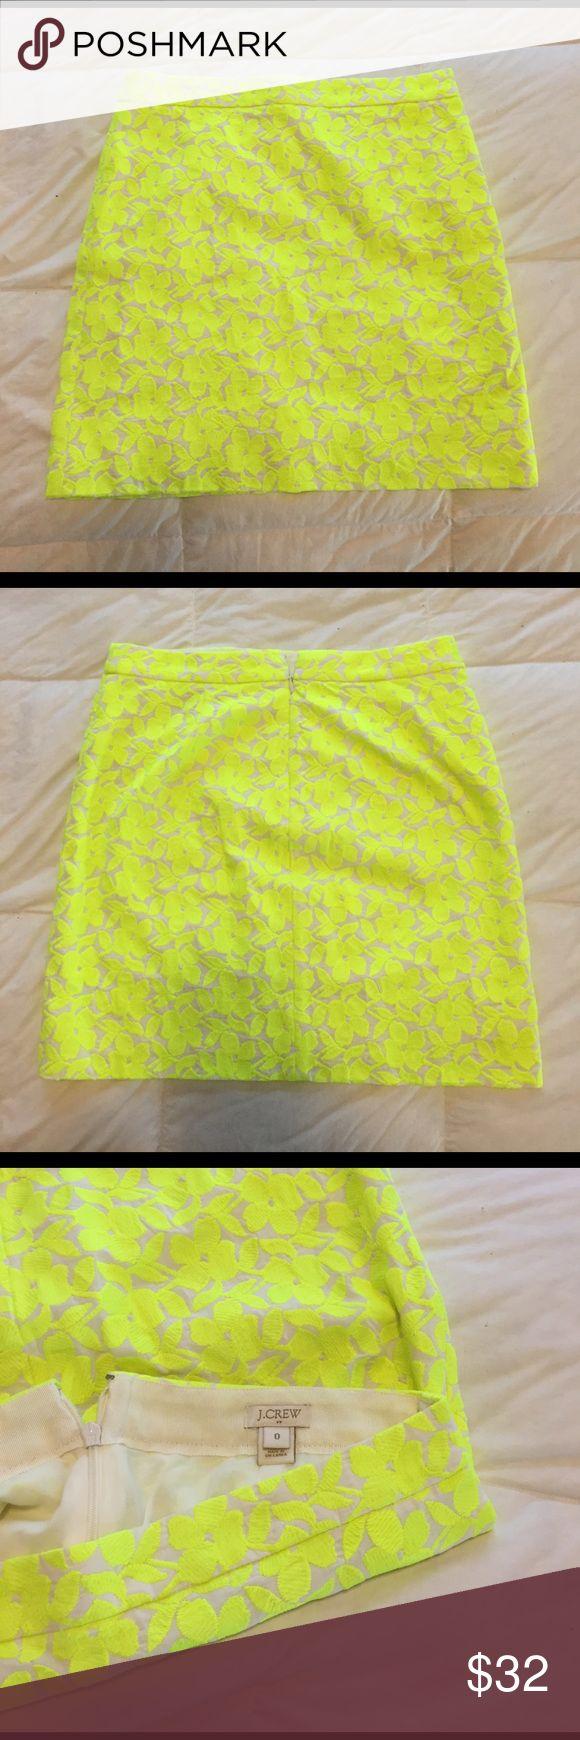 Neon Yellow Floral Skirt Neon Yellow Floral Skirt J. Crew Skirts Pencil